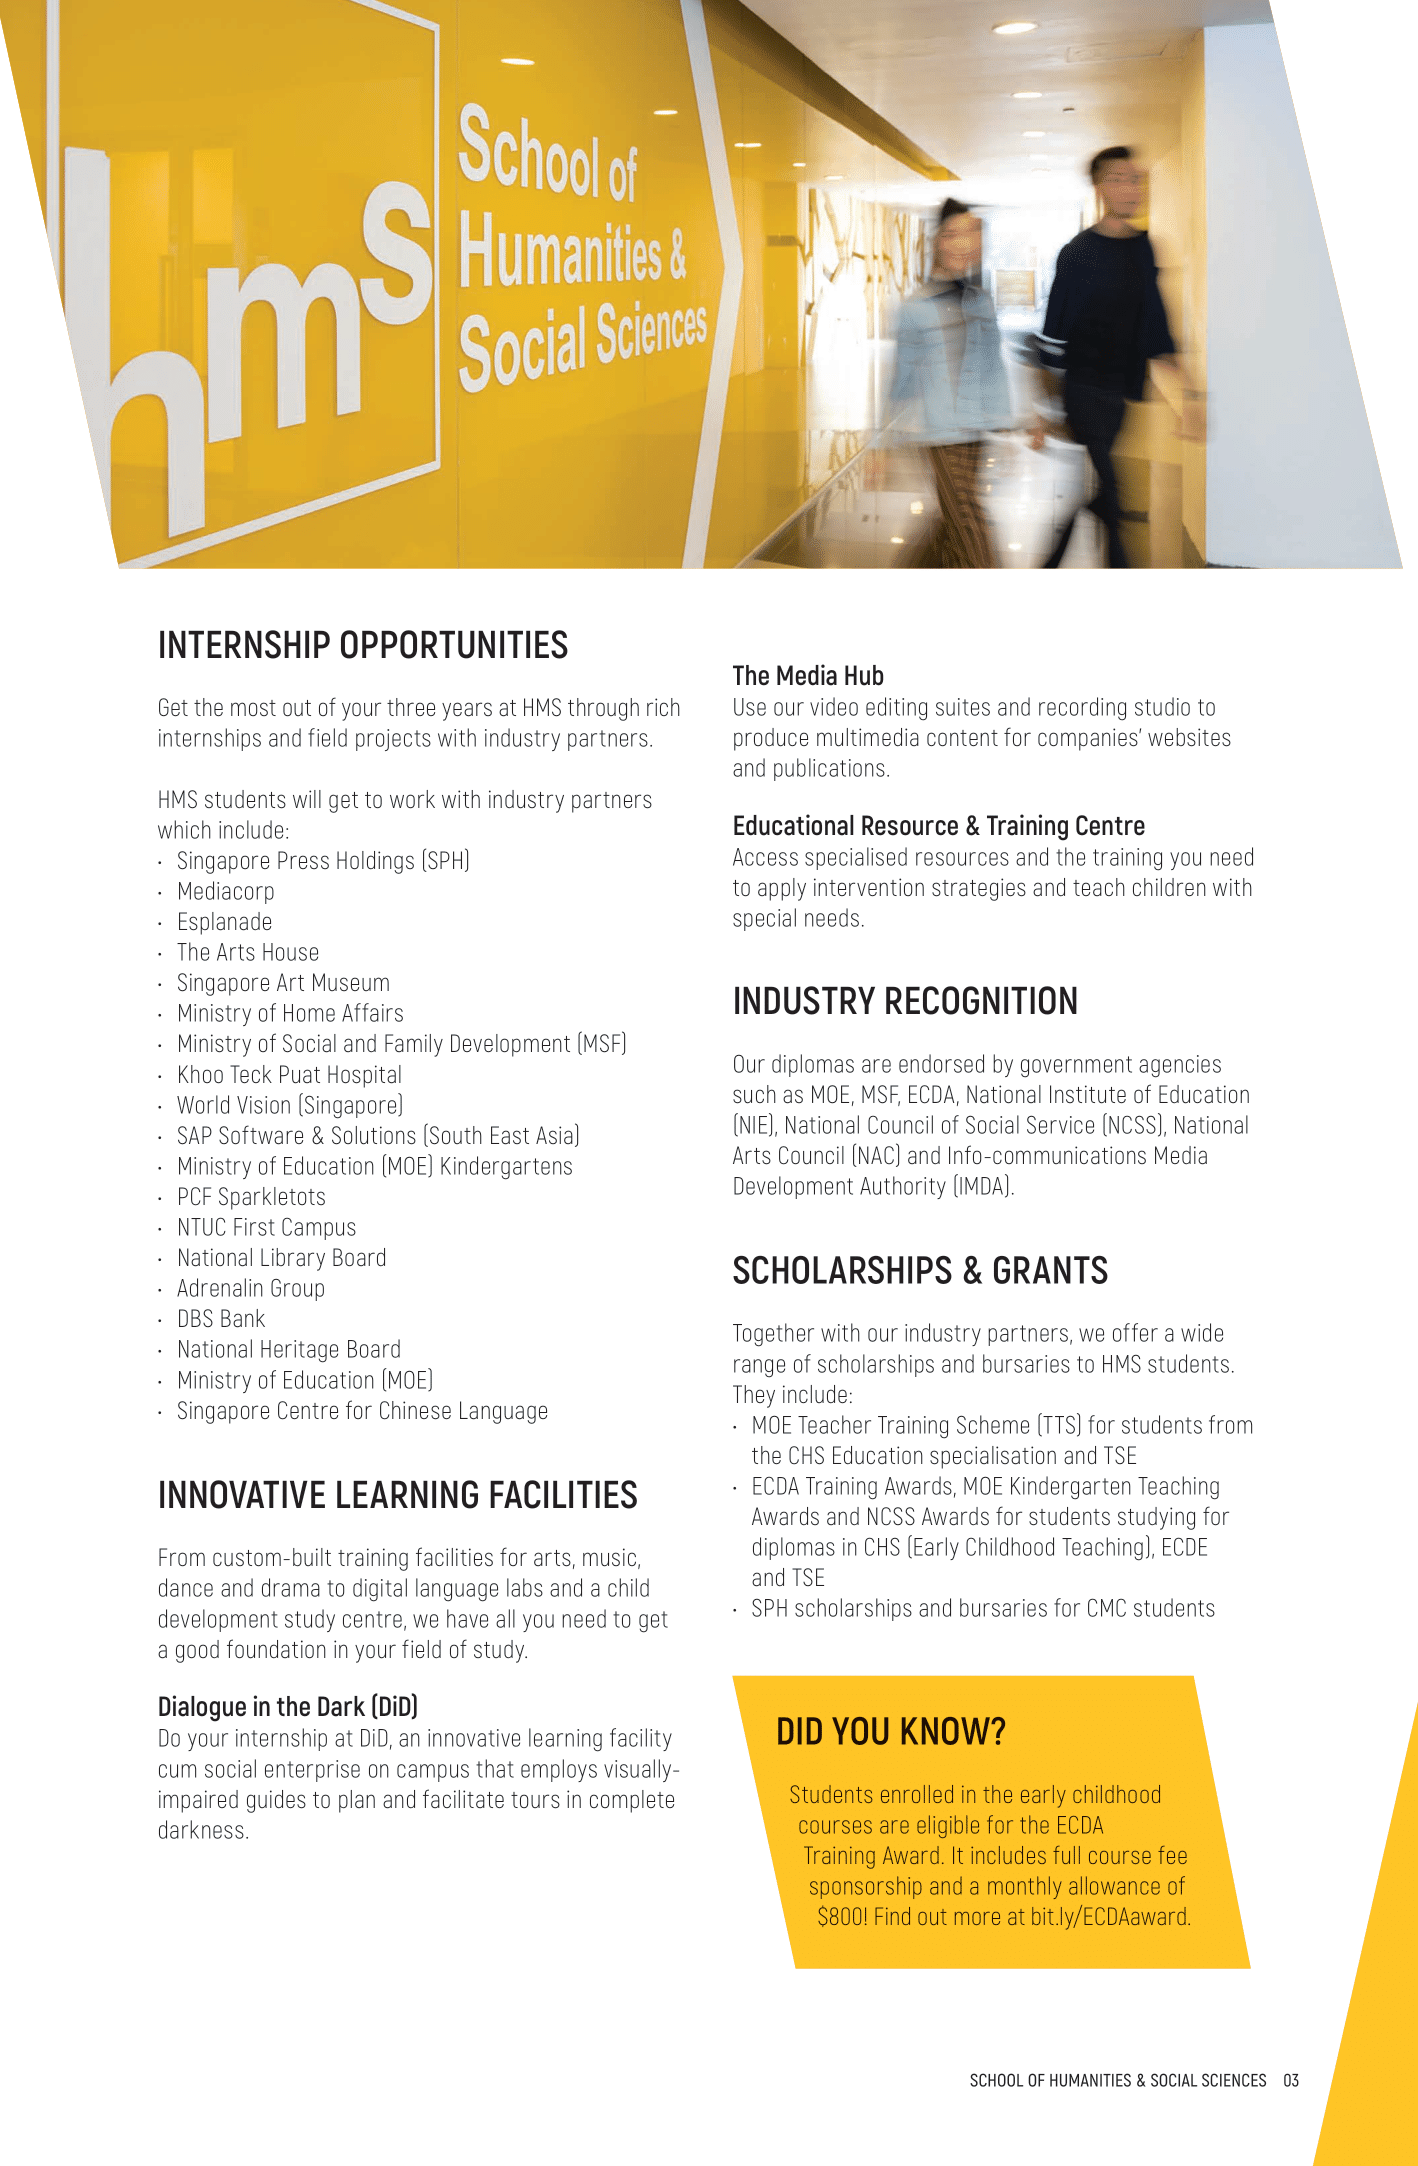 School of Humanities & Social Sciences 2020-05